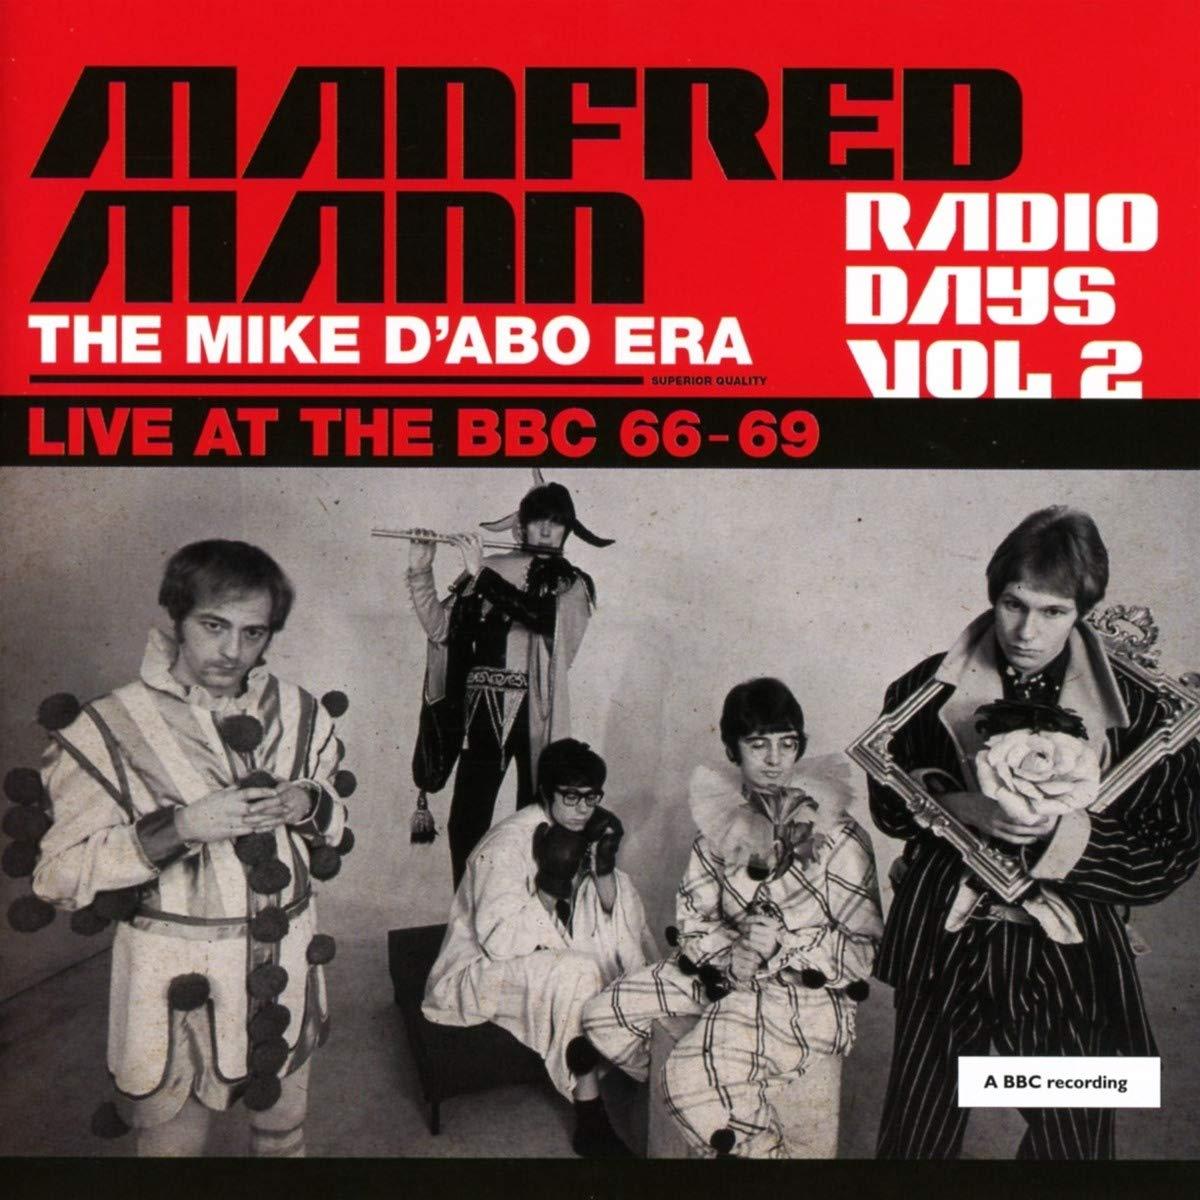 Manfred Mann Radio Days Vol 2 (The Mike D\'abo Era)